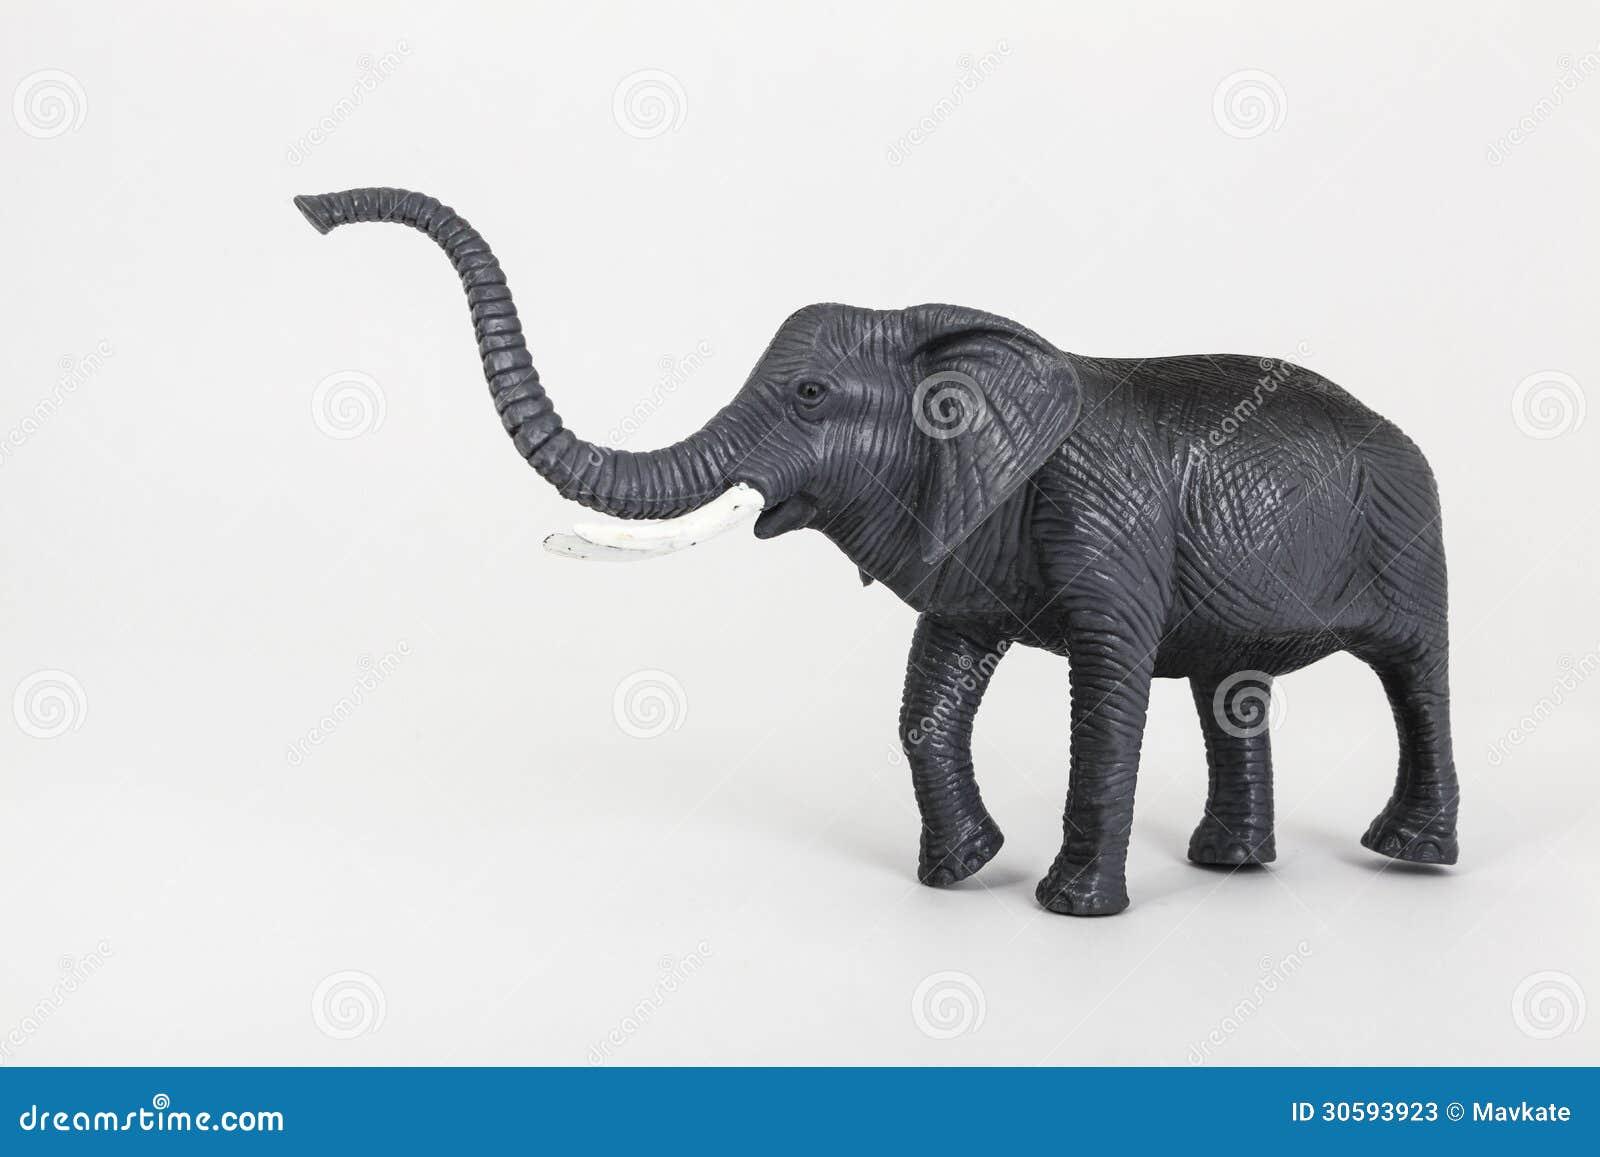 African Elephant Toys For Boys : Plastic toy elephant stock photo cartoondealer